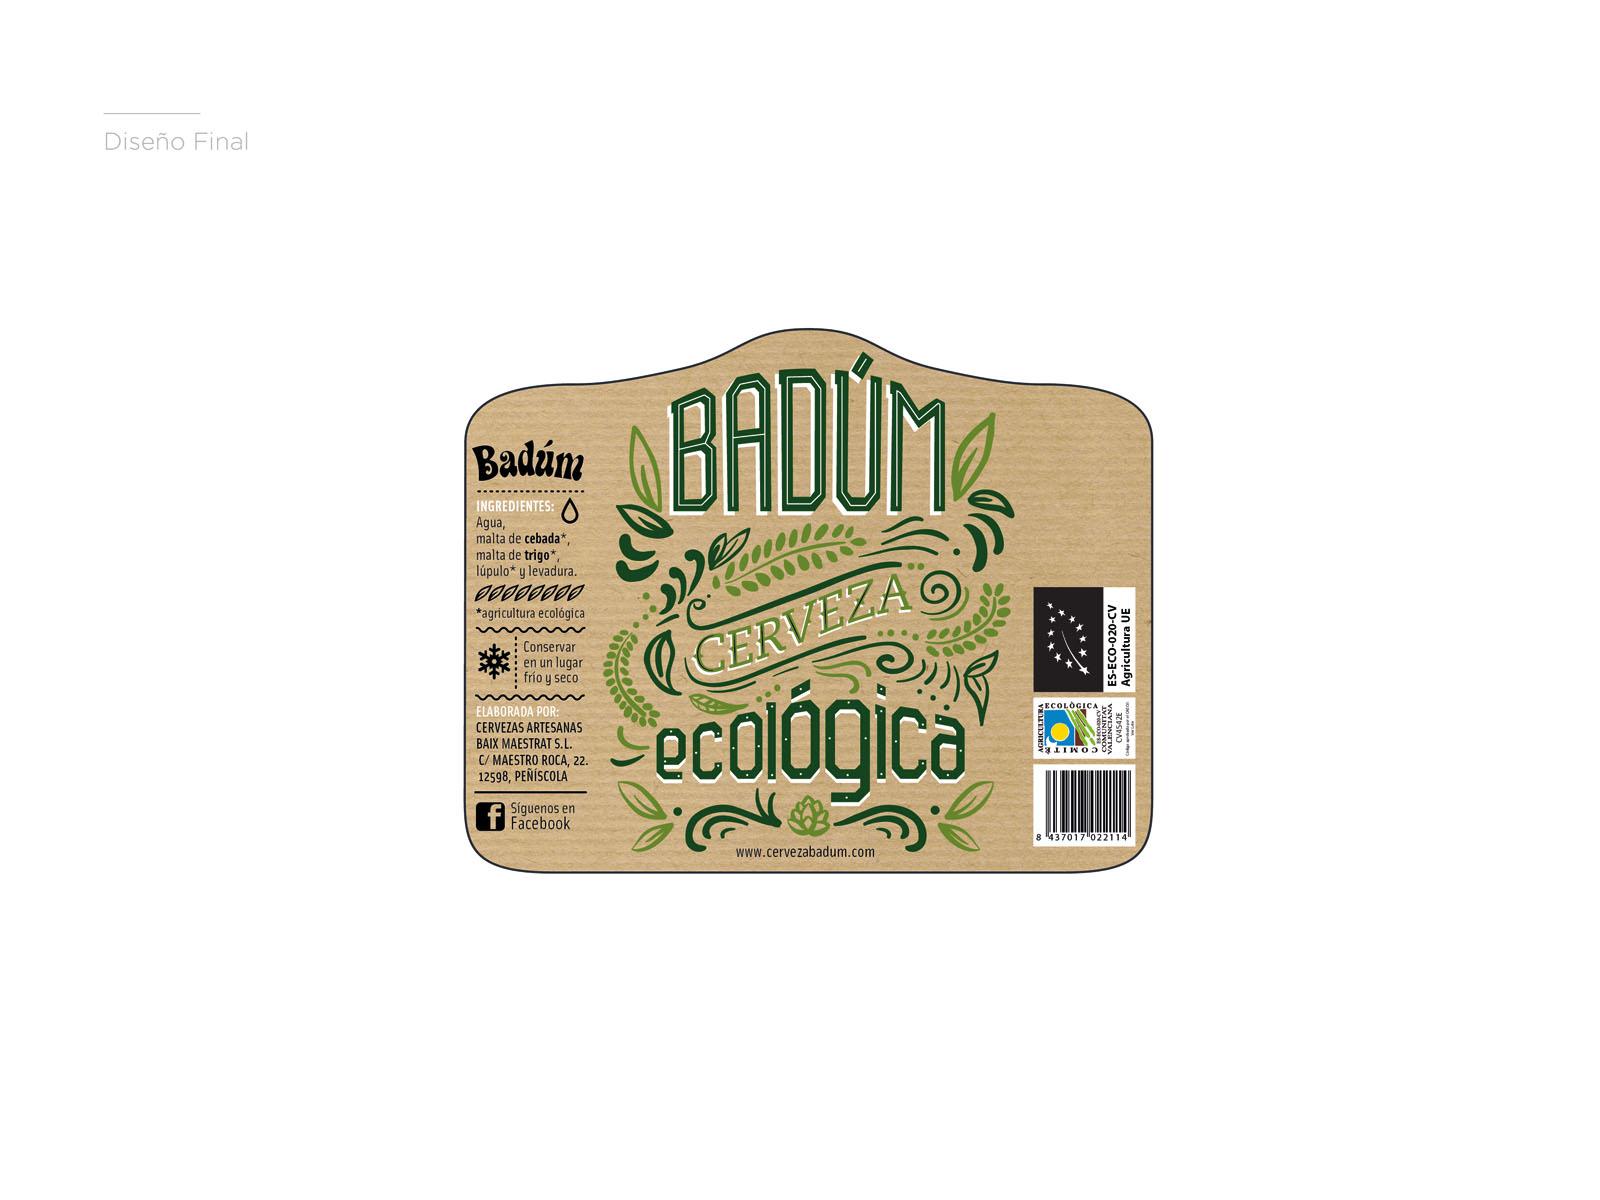 Diseño de etiqueta ecológica para cervezas Badum, papel reciclado, lettering, cerveza eco, packaging para botellas de cerveza, concepto, color, boceto etiqueta